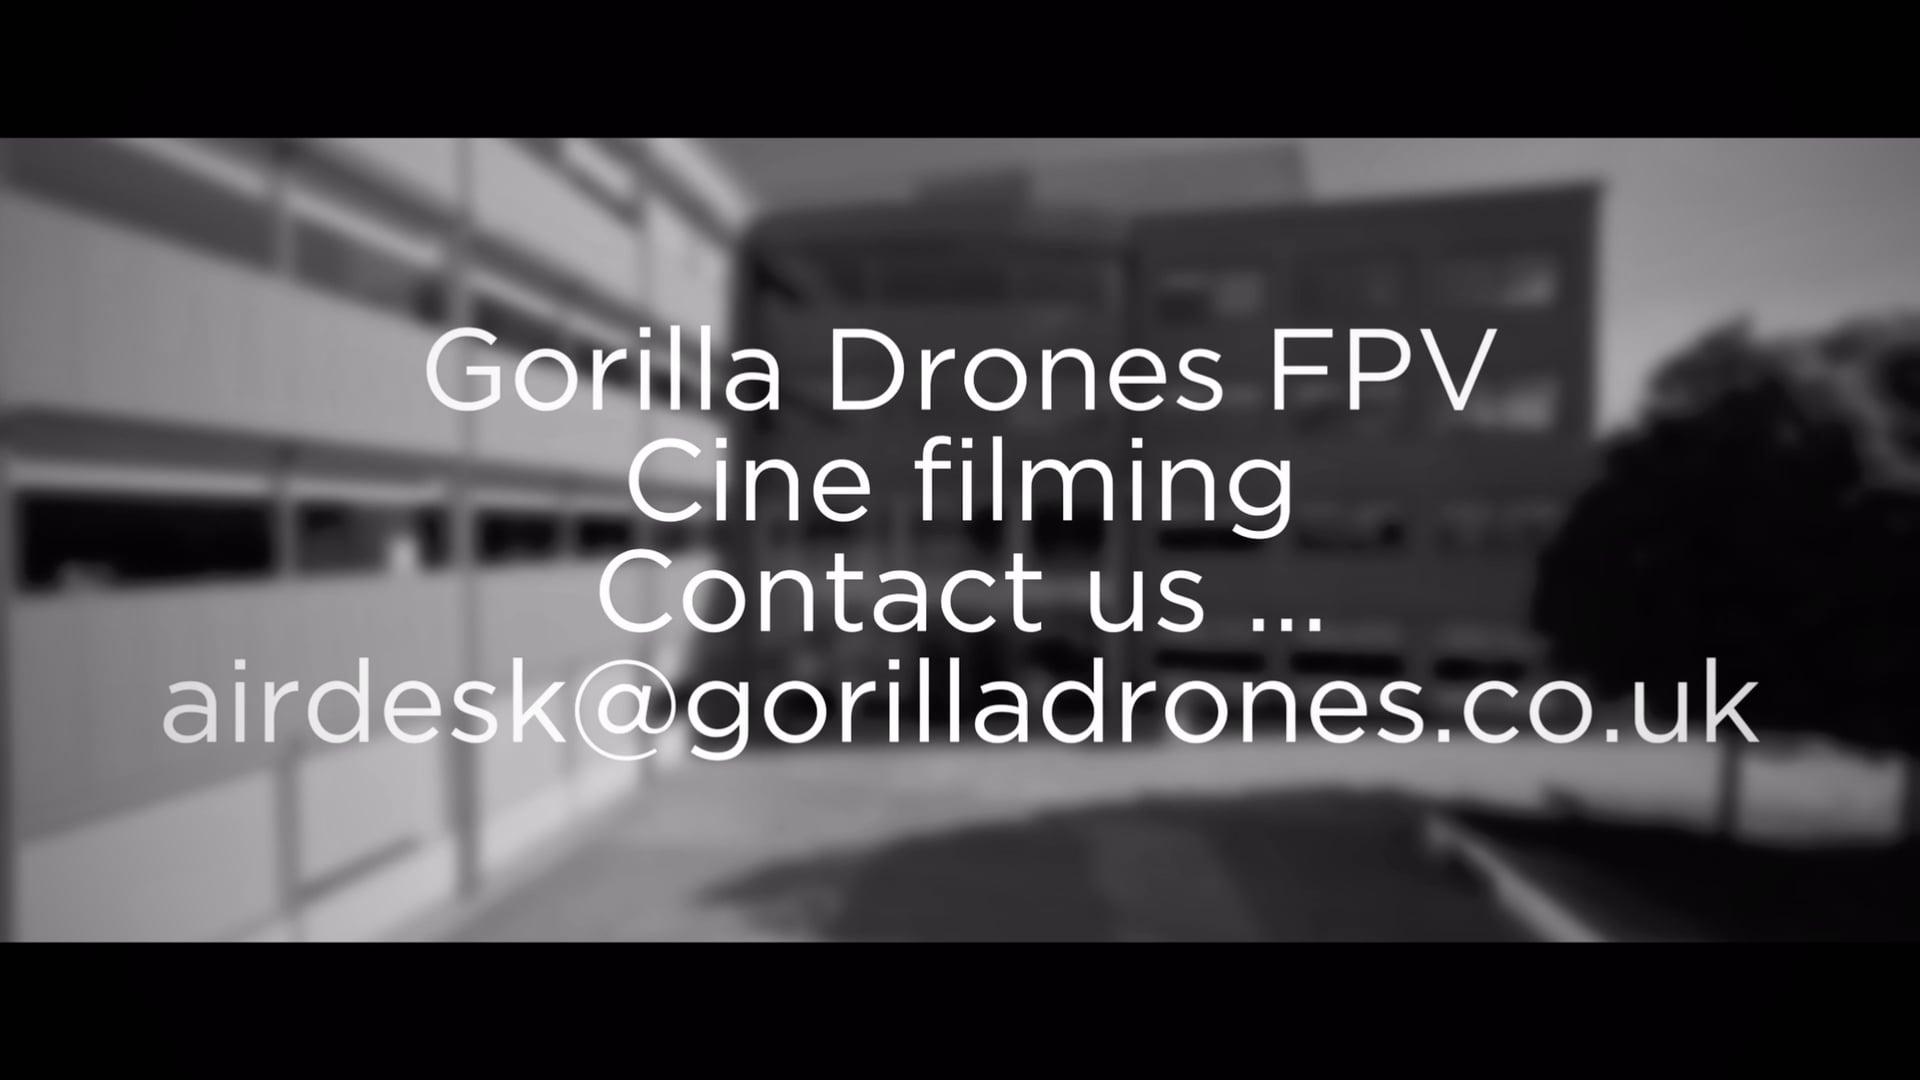 FPV Cine filming